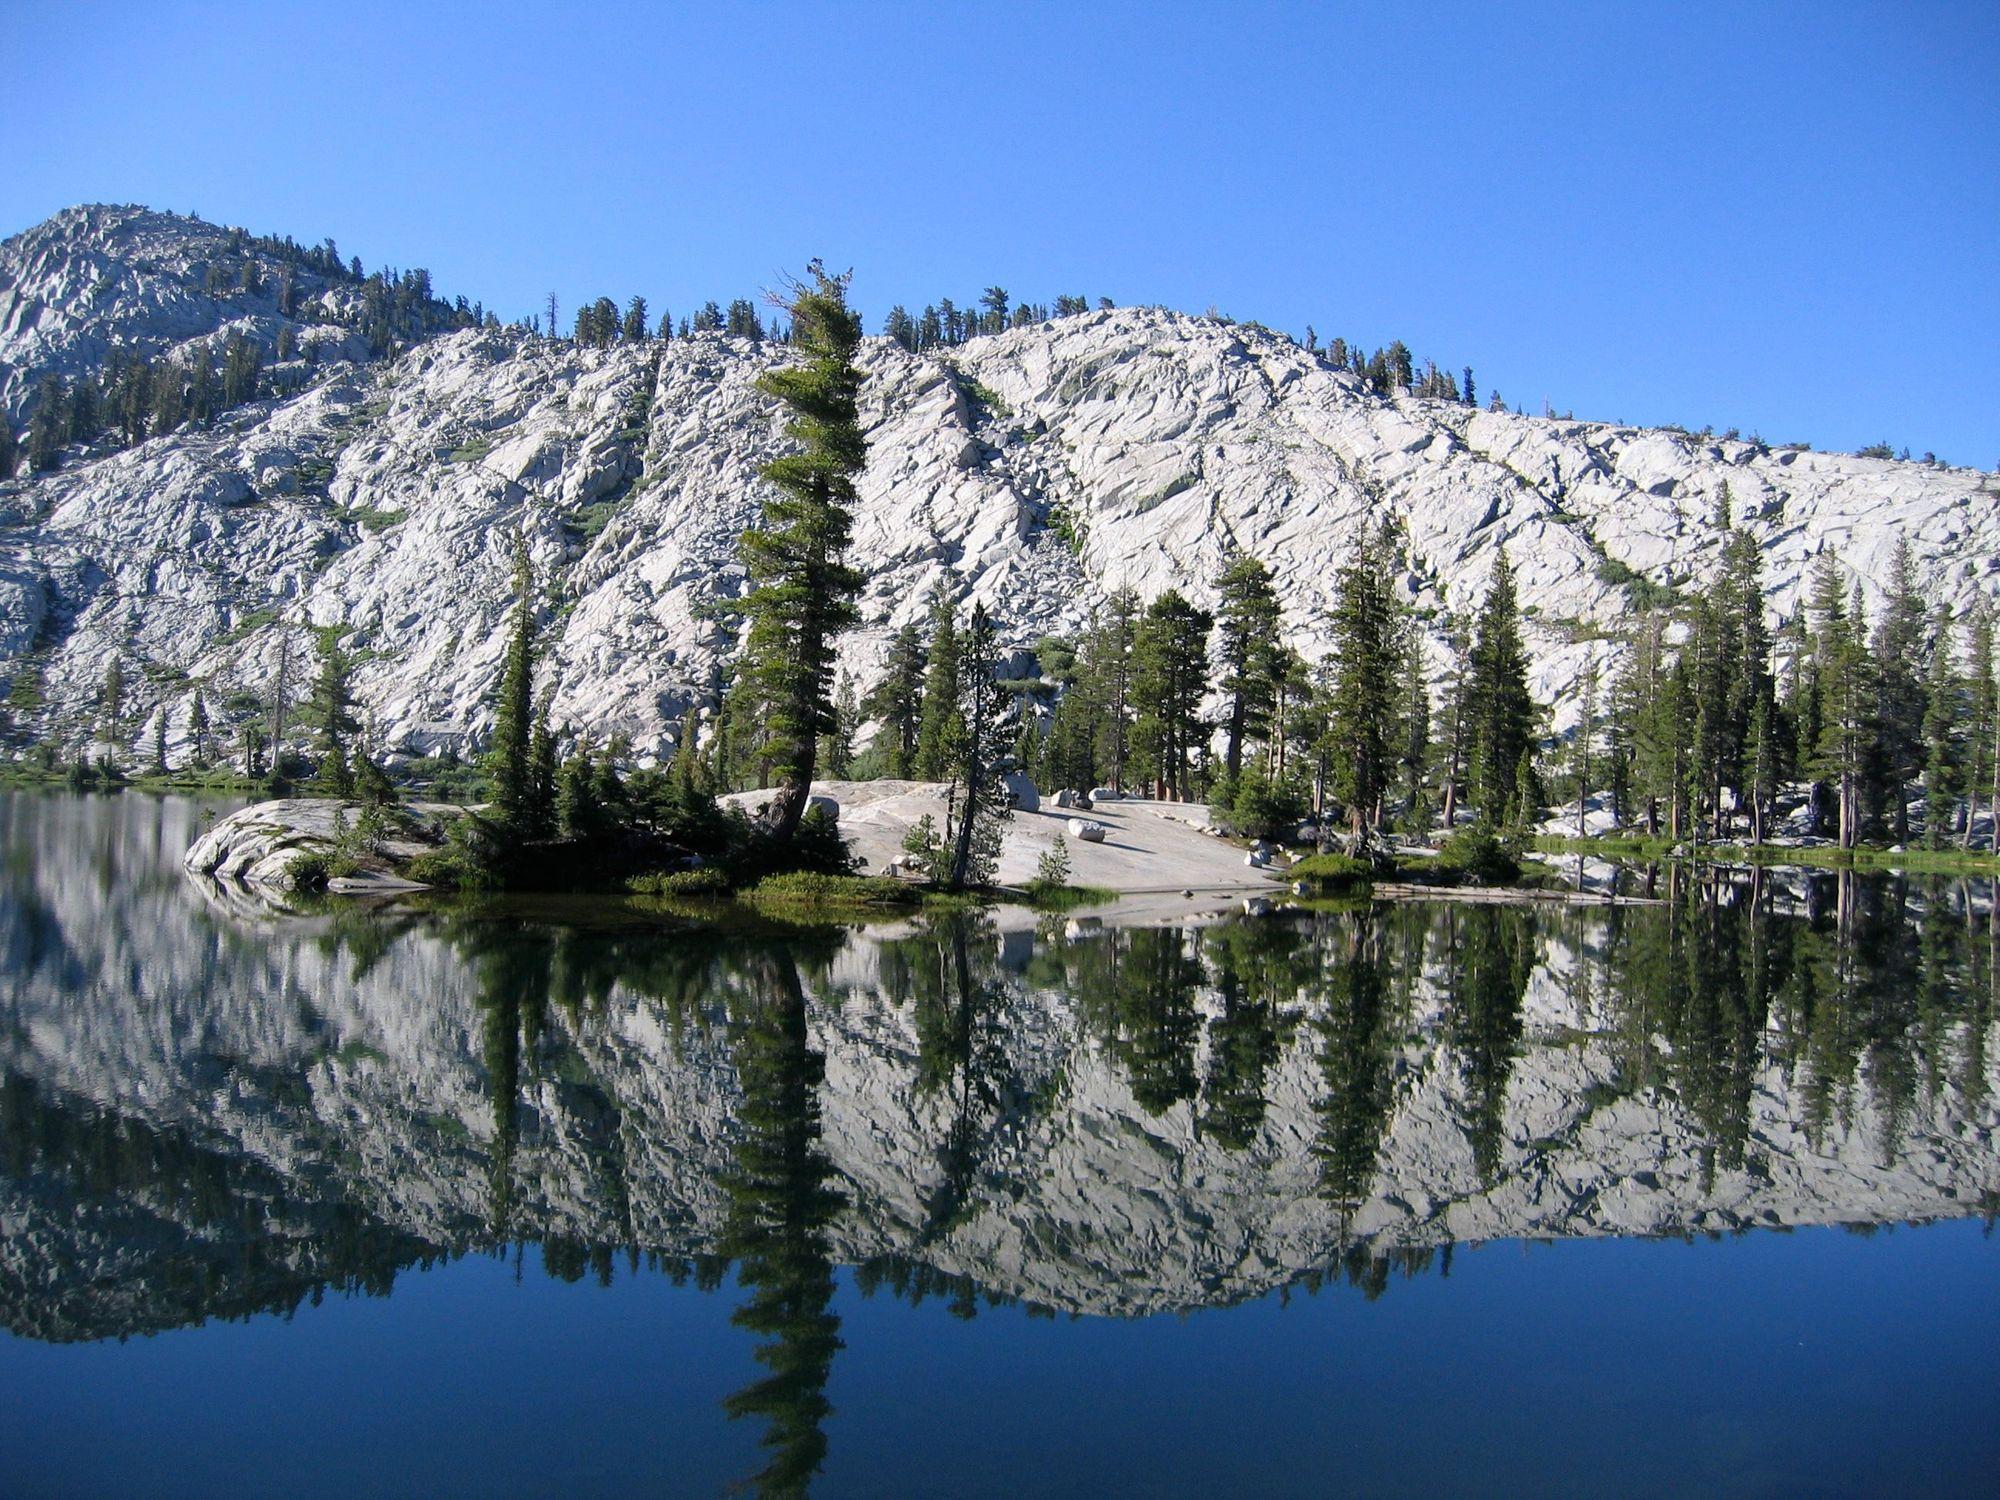 Yosemite Backcountry Lake